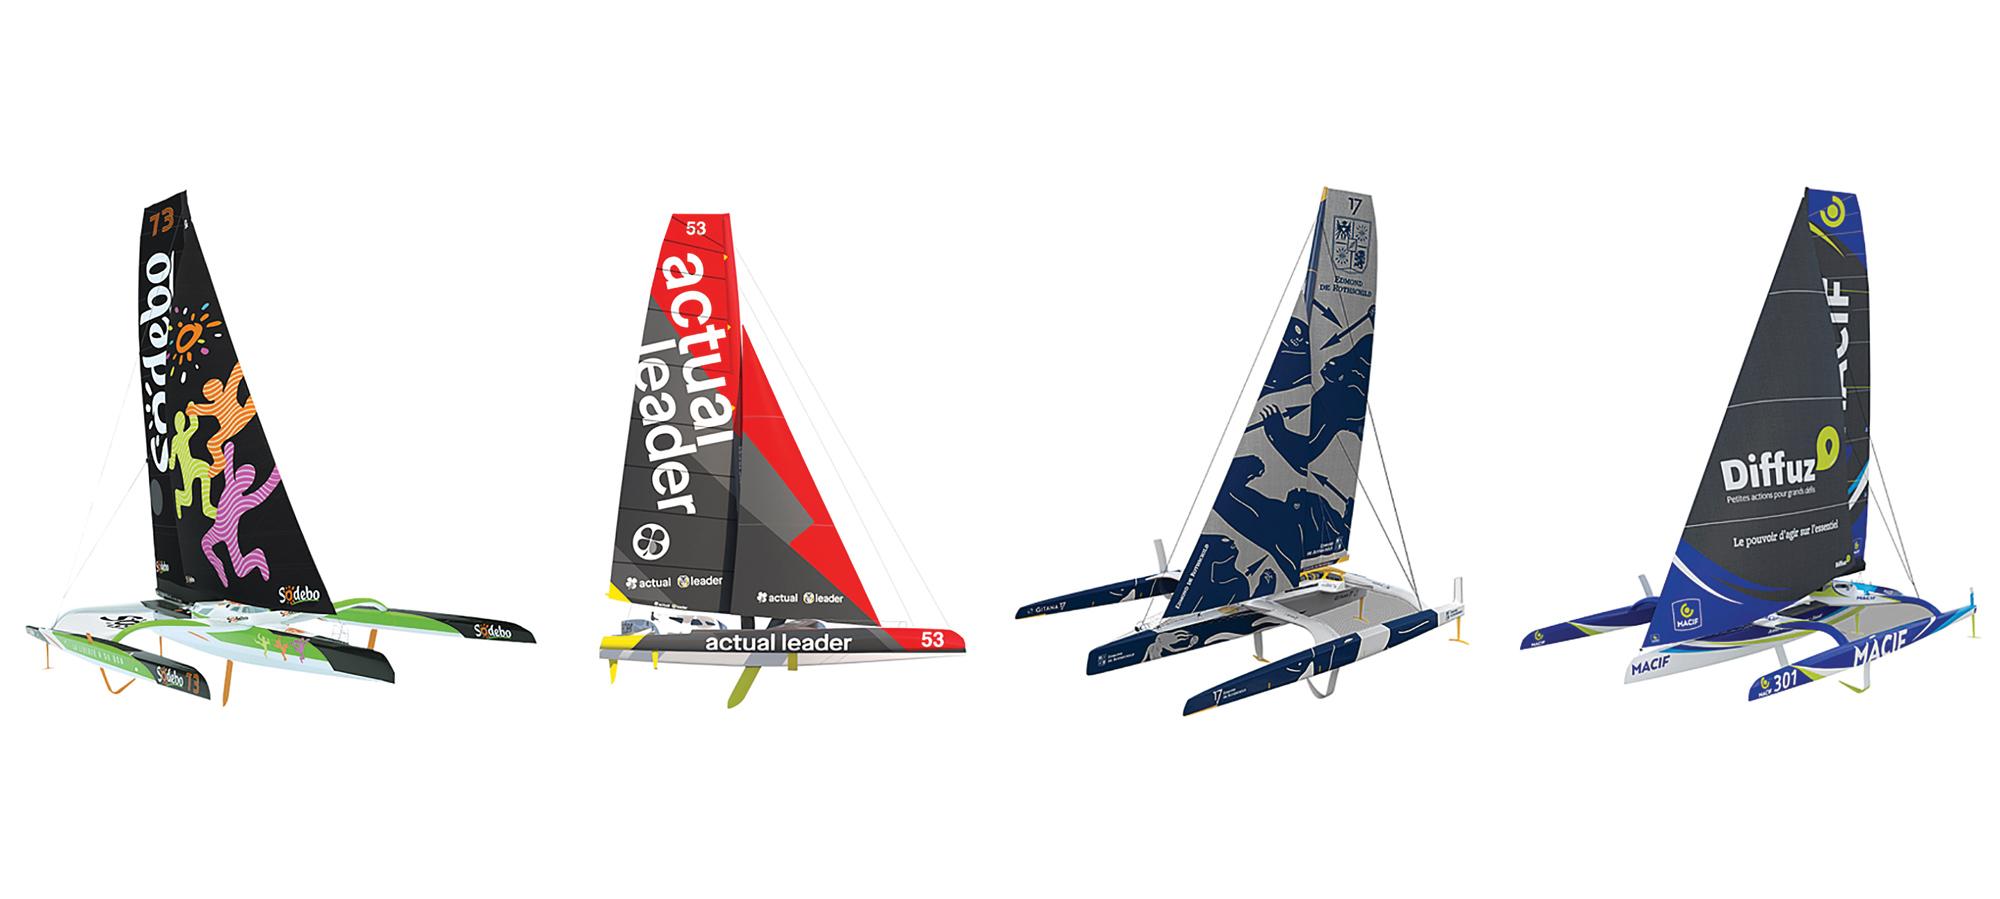 brest-atlantiques-trimaran-race-fleet